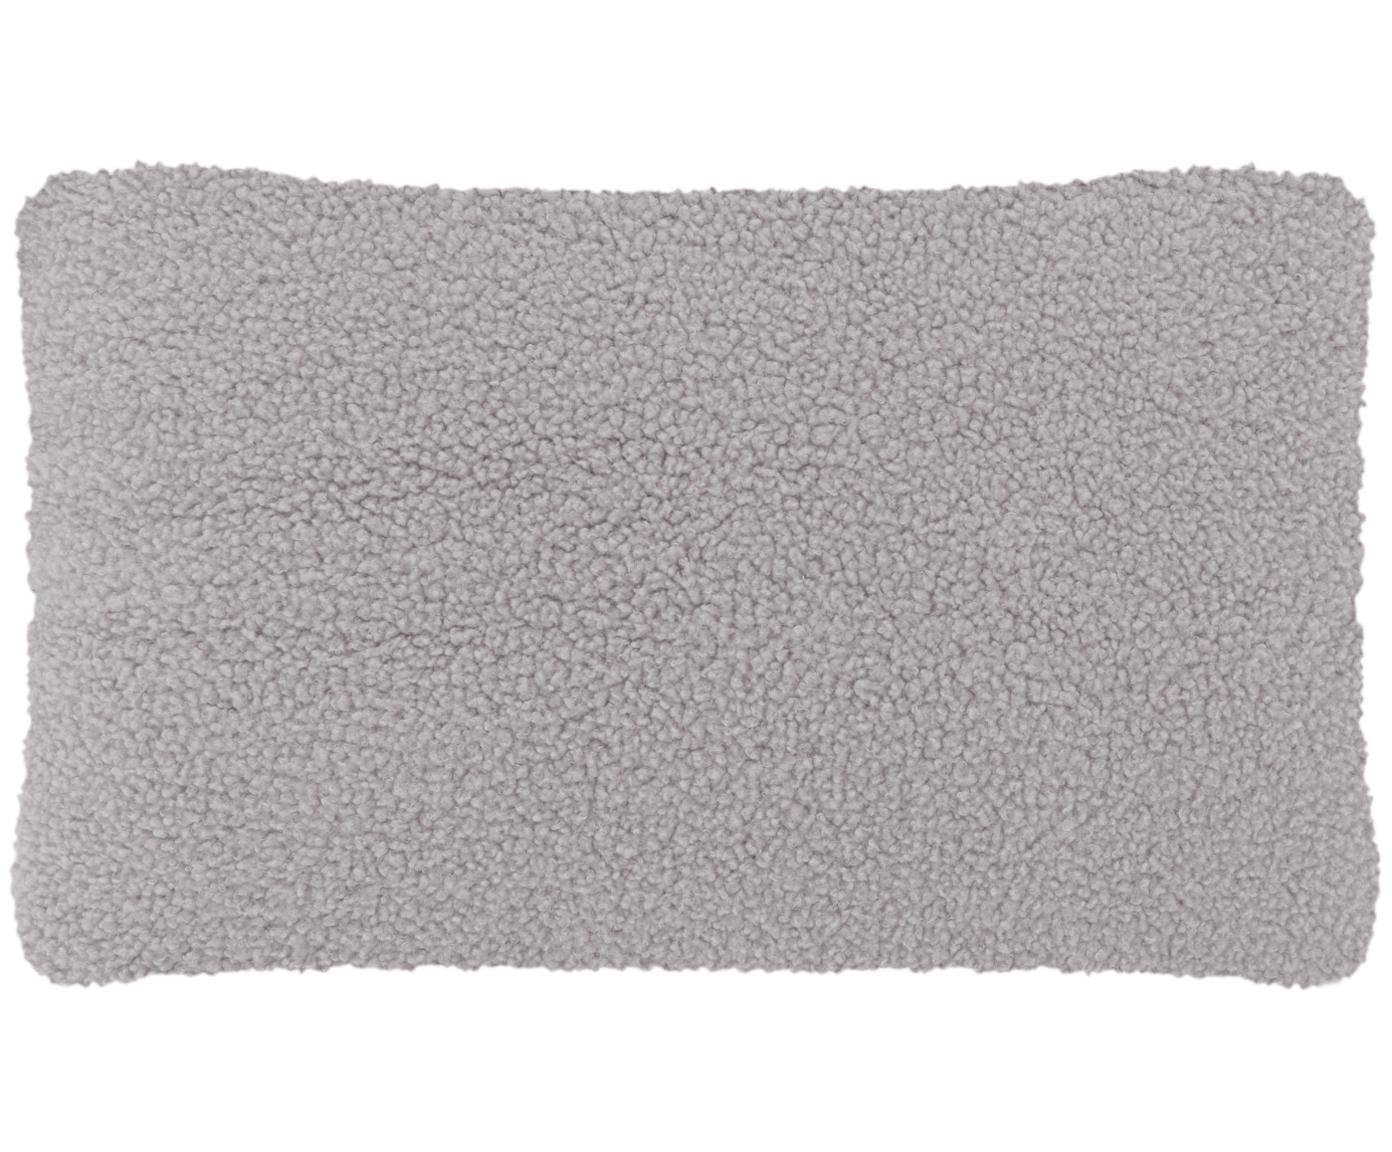 Federa arredo in teddy Mille, Retro: 100% poliestere (teddy), Grigio chiaro, Larg. 30 x Lung. 50 cm